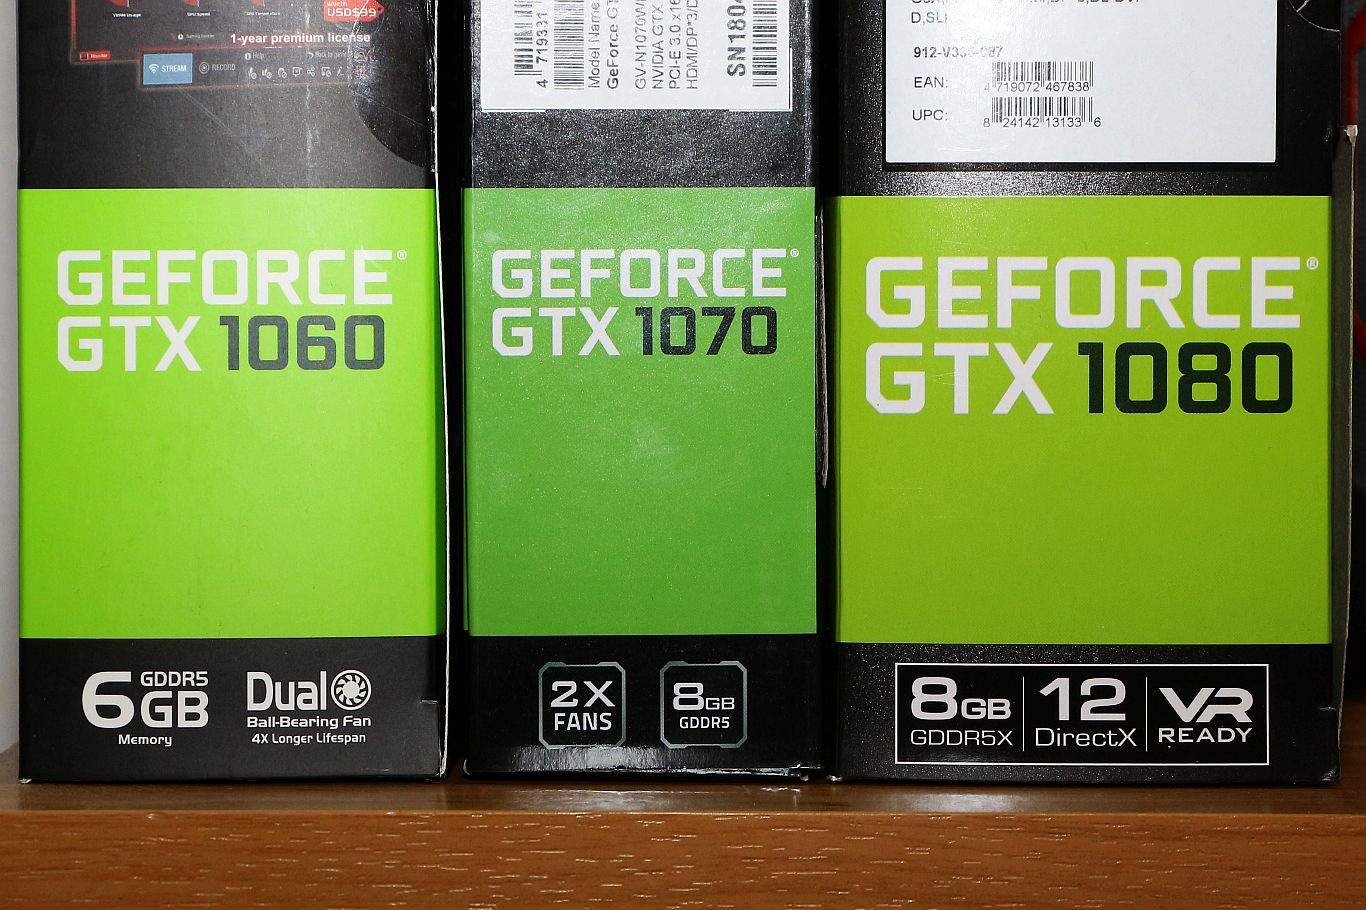 nvidia geforce gtx 1080 vgas2